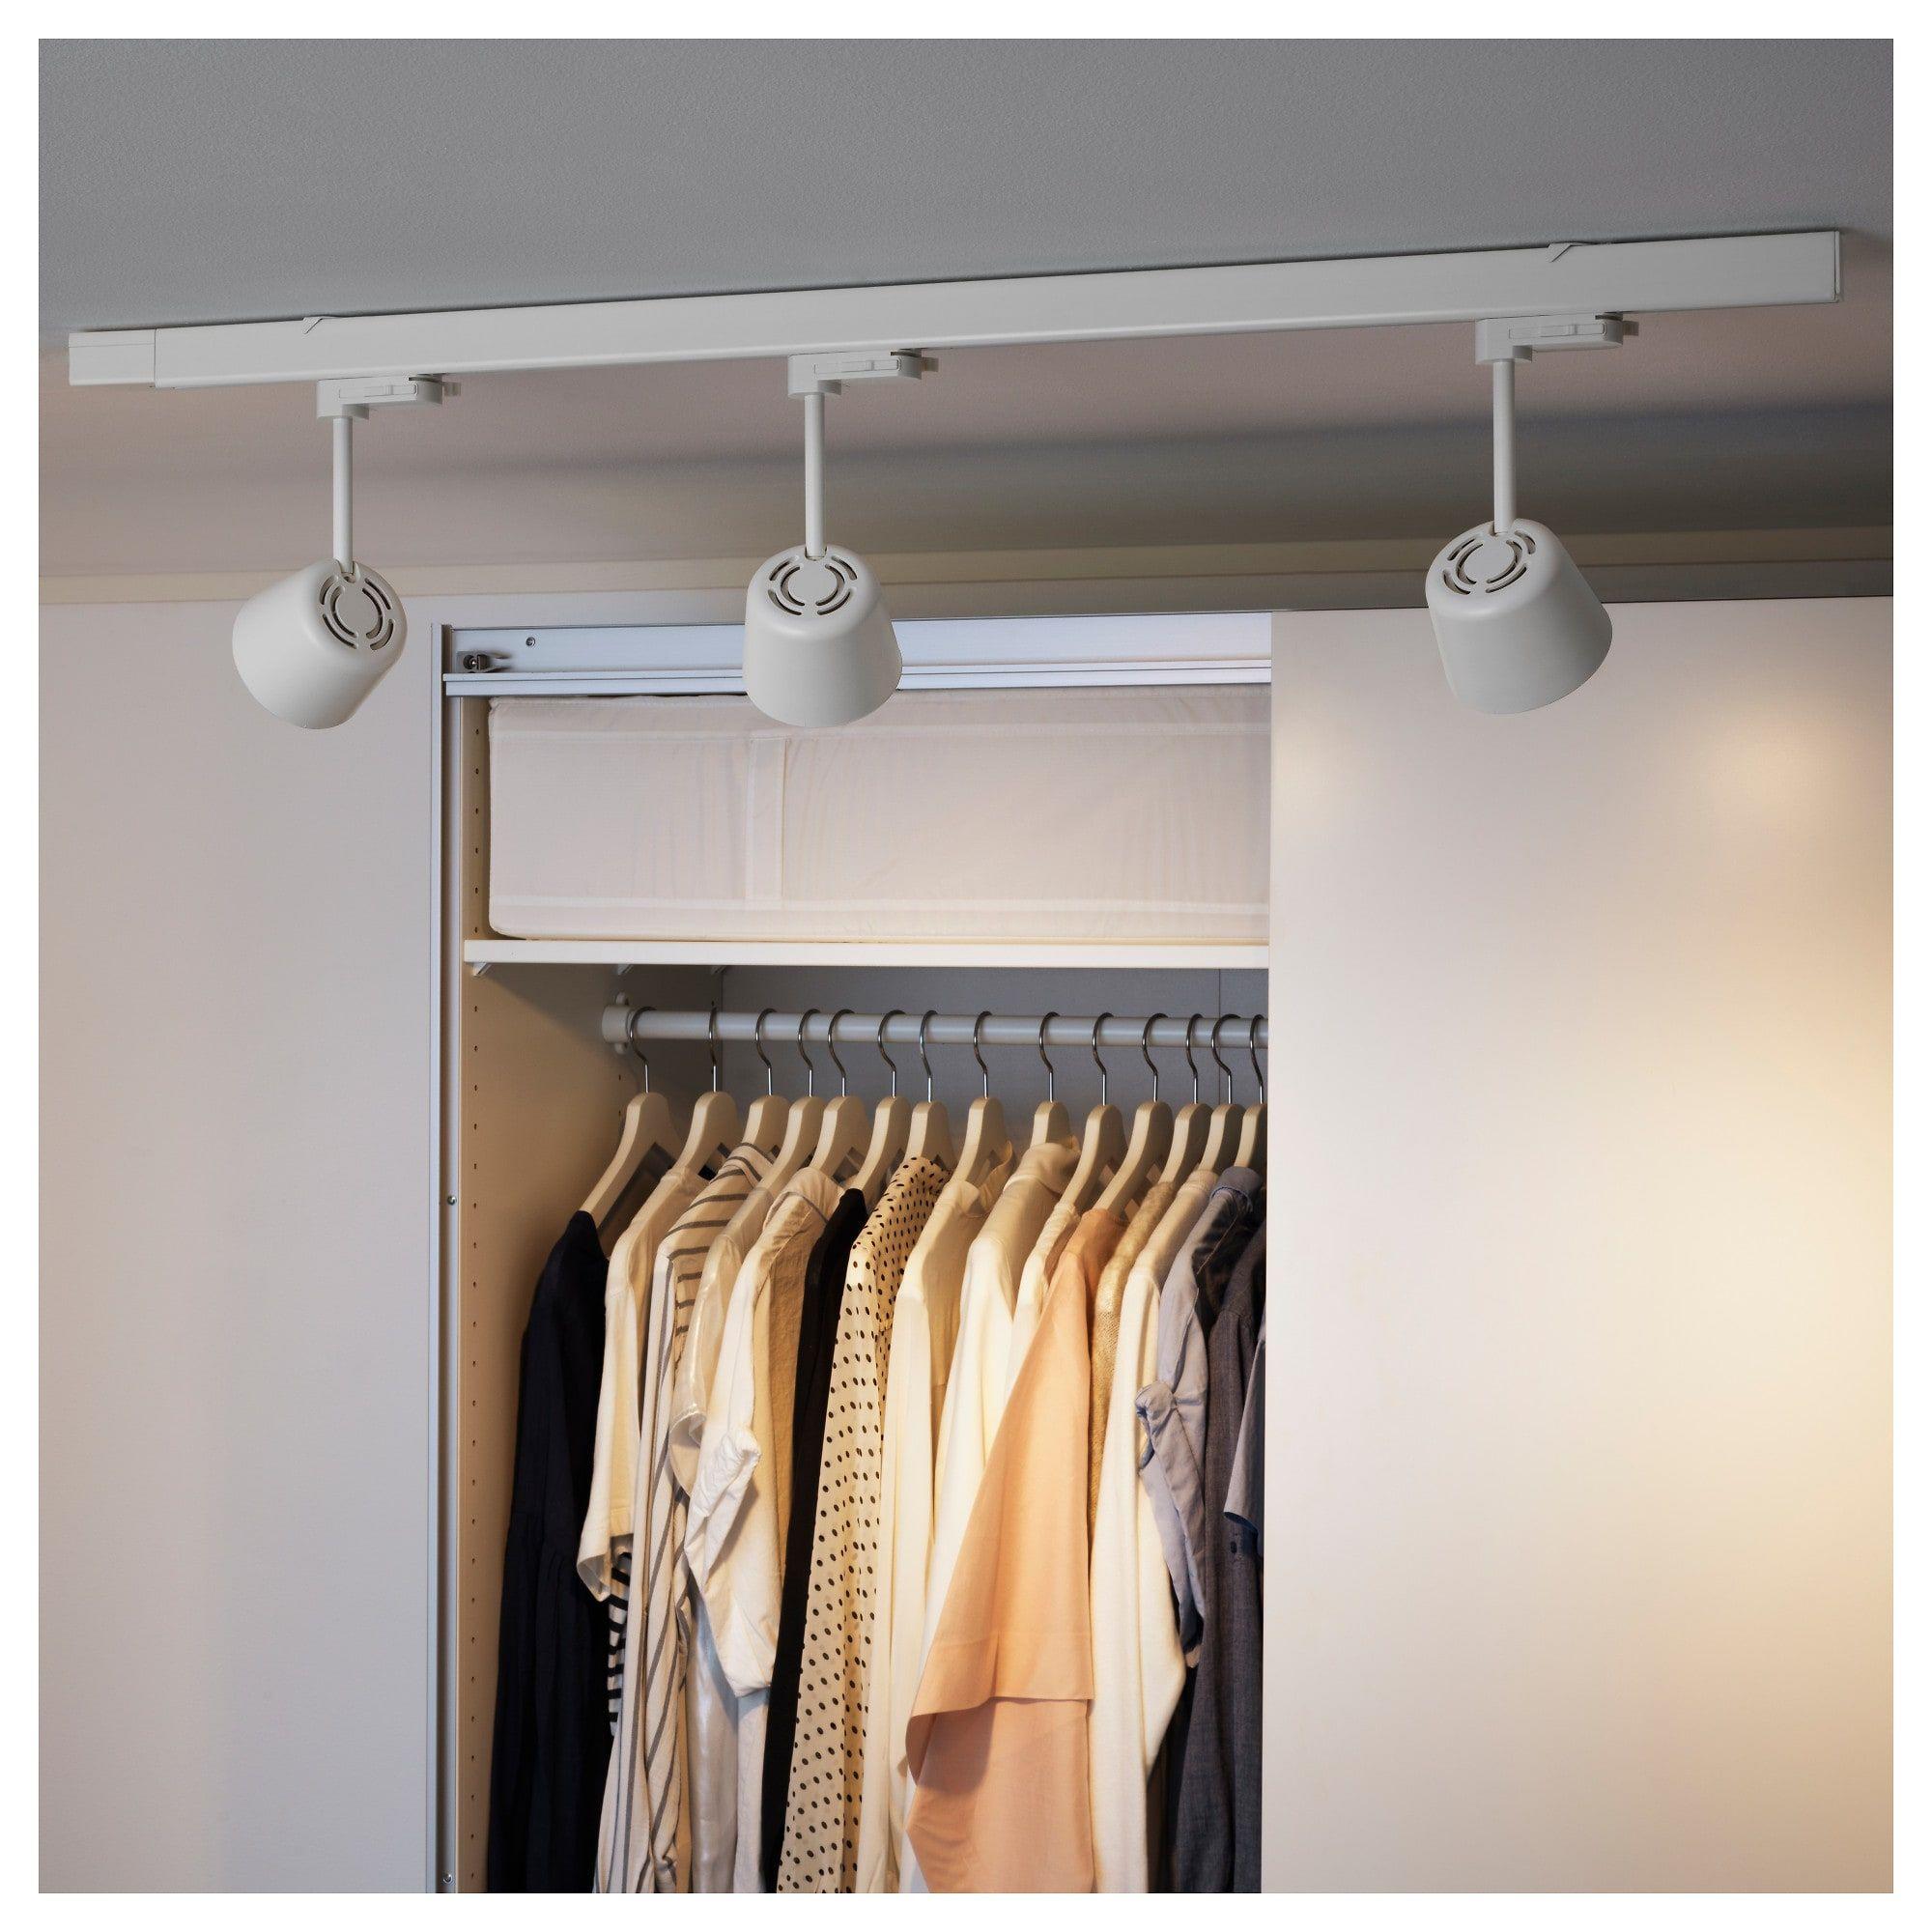 Ikea Skeninge Track With 2 Led Spotlights White Ikea Ikea Lamp Shade Ikea Lamp